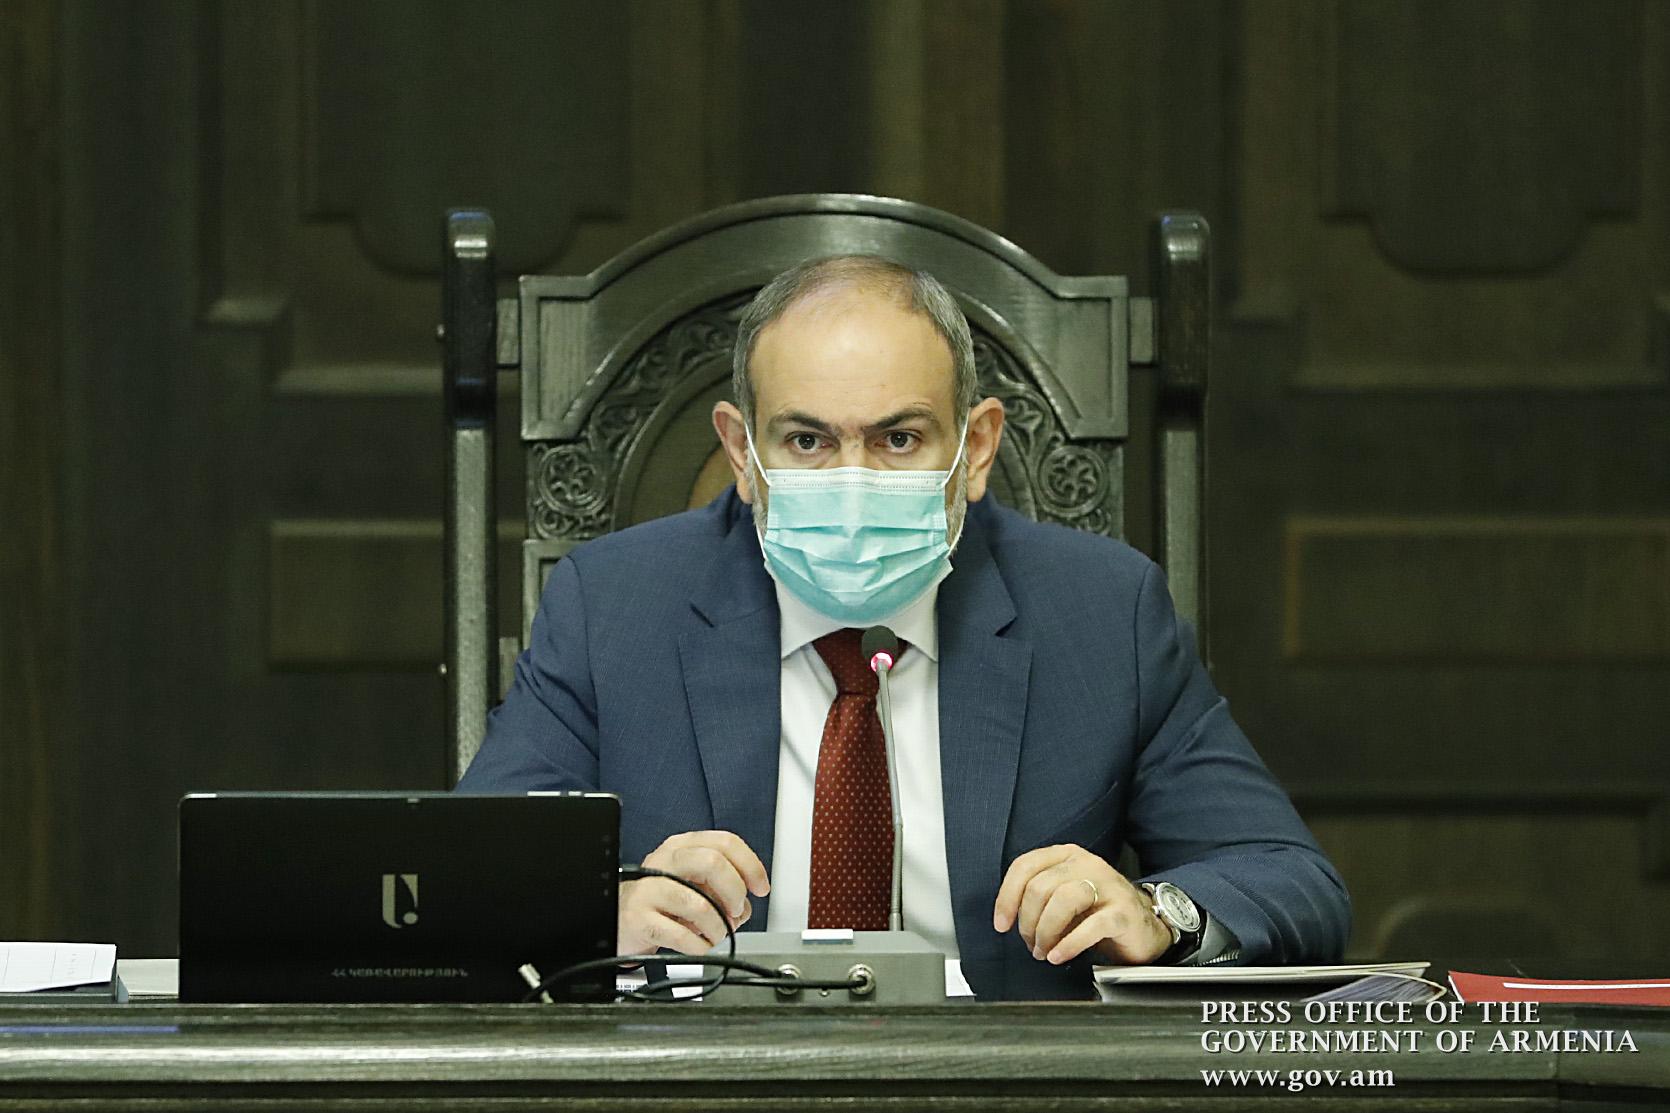 Photo of Հայաստանի հետ պետք չէ ուժի եւ սպառնալիքի լեզվով խոսել. Նիկոլ Փաշինյան